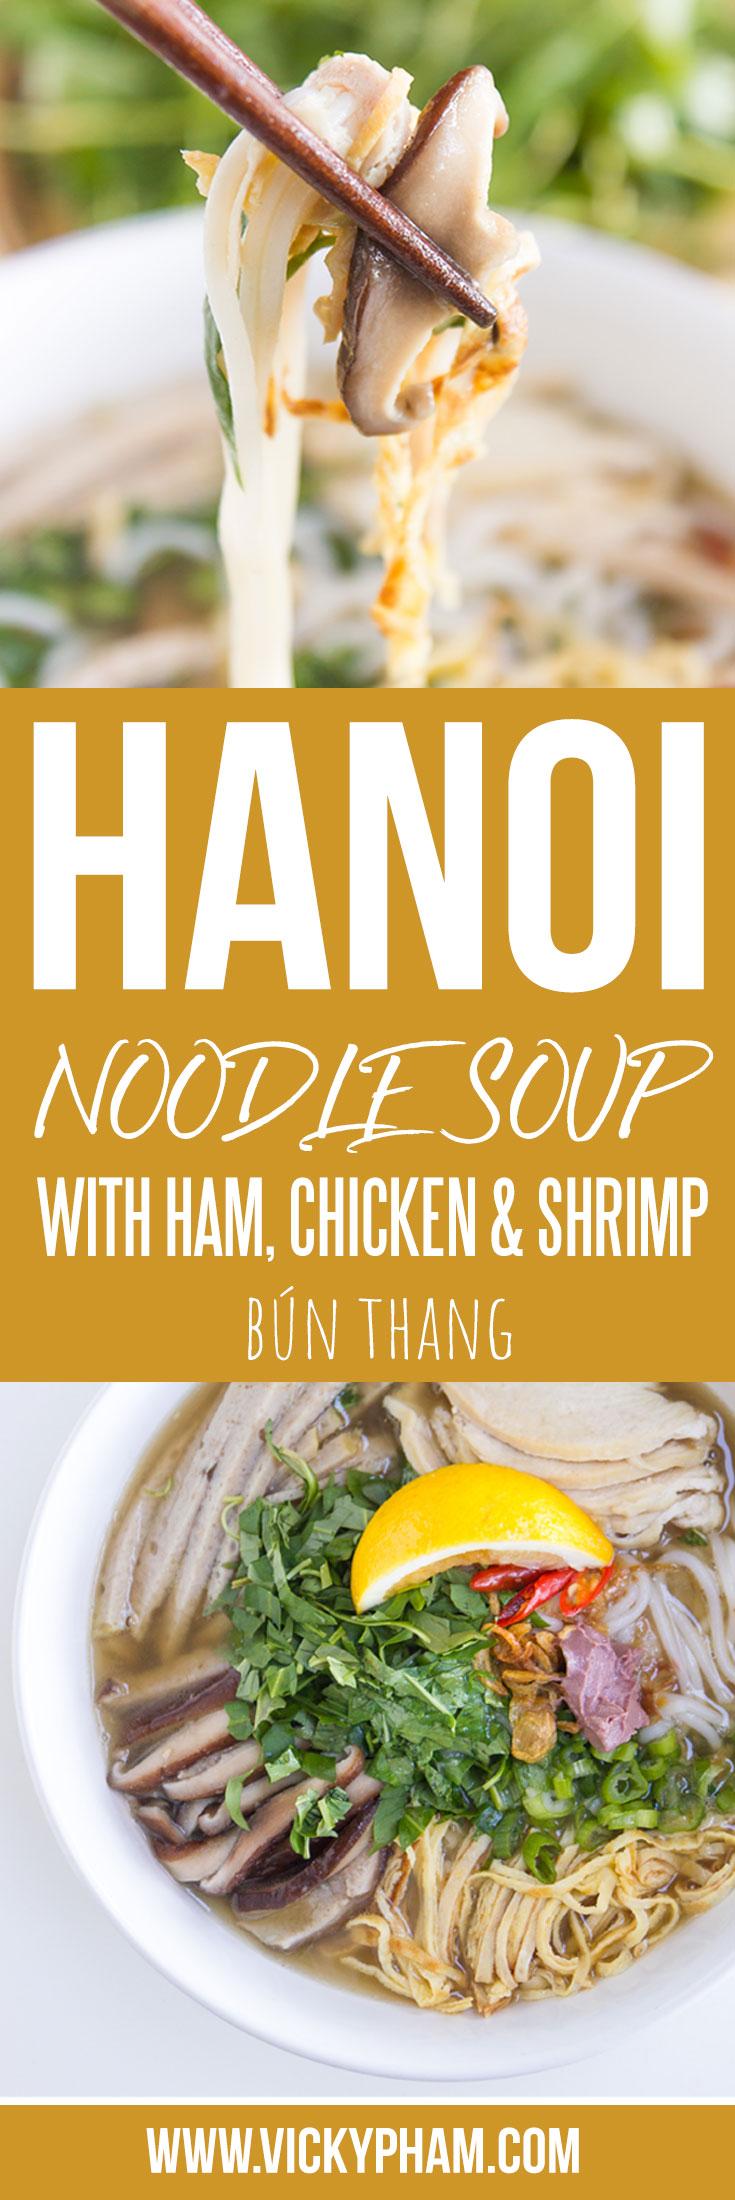 pinterest-bun-thang-hano-chicken-noodle-soup.jpg